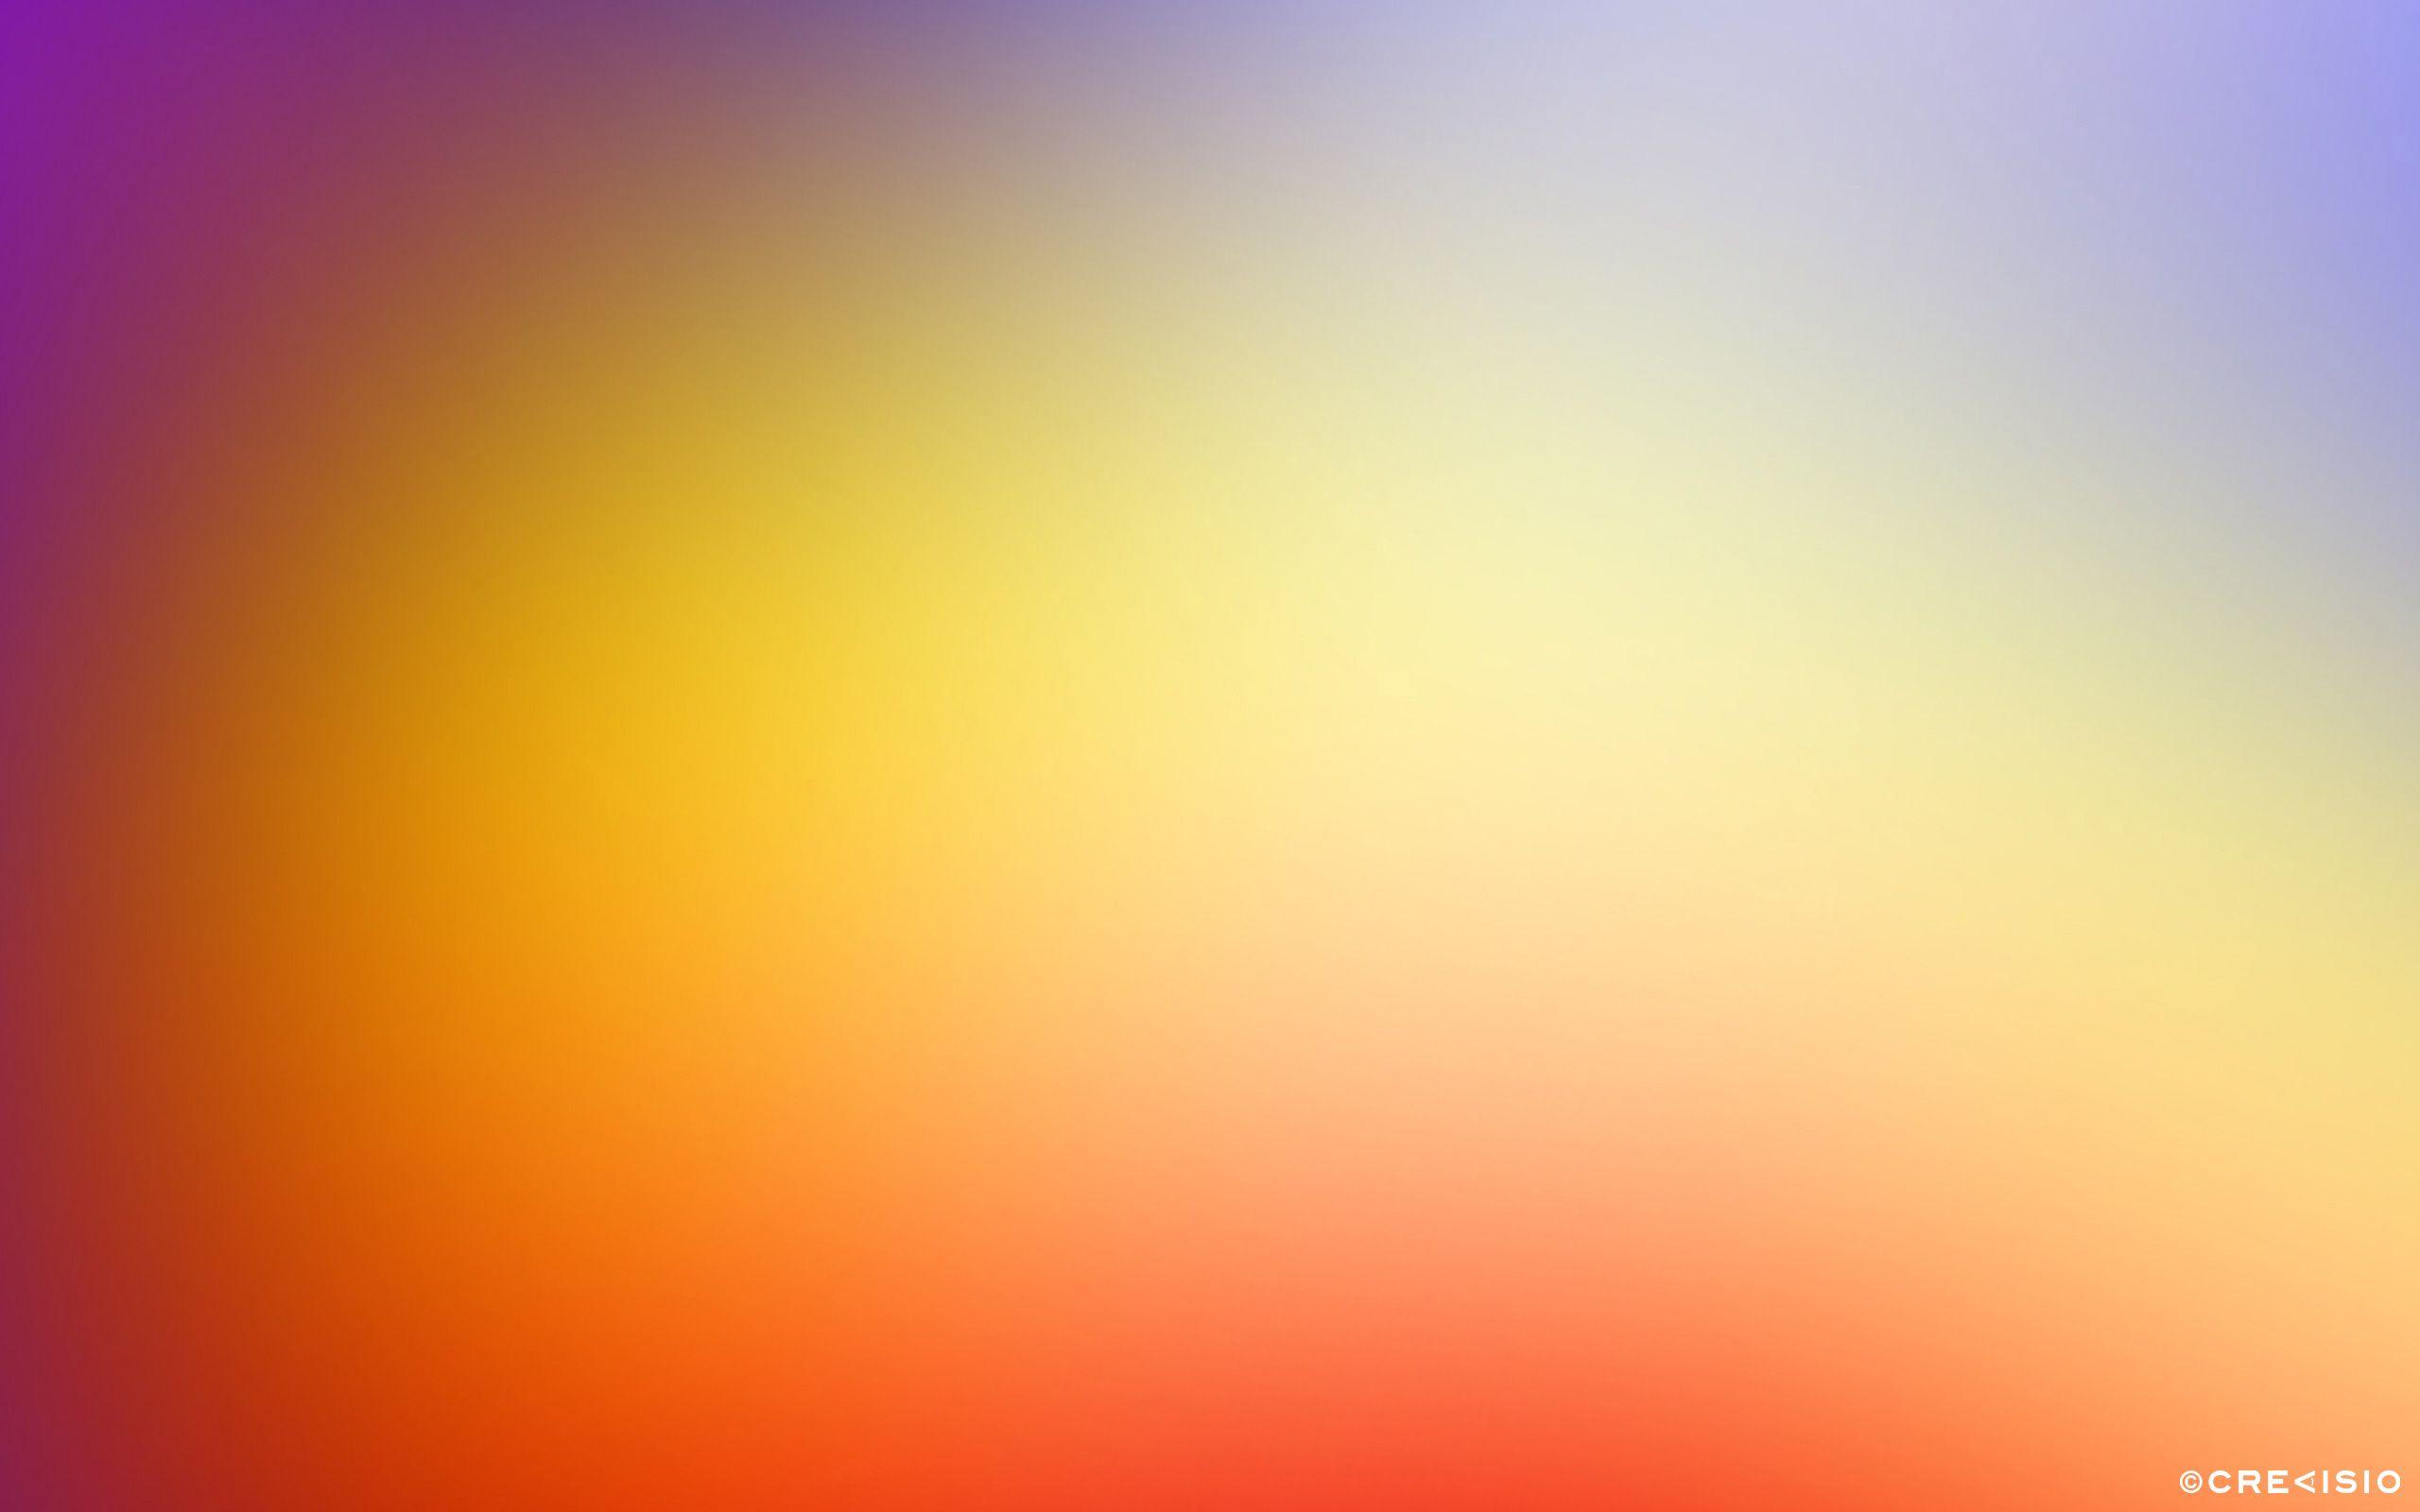 HQ Gradient Wallpapers | File 110.97Kb